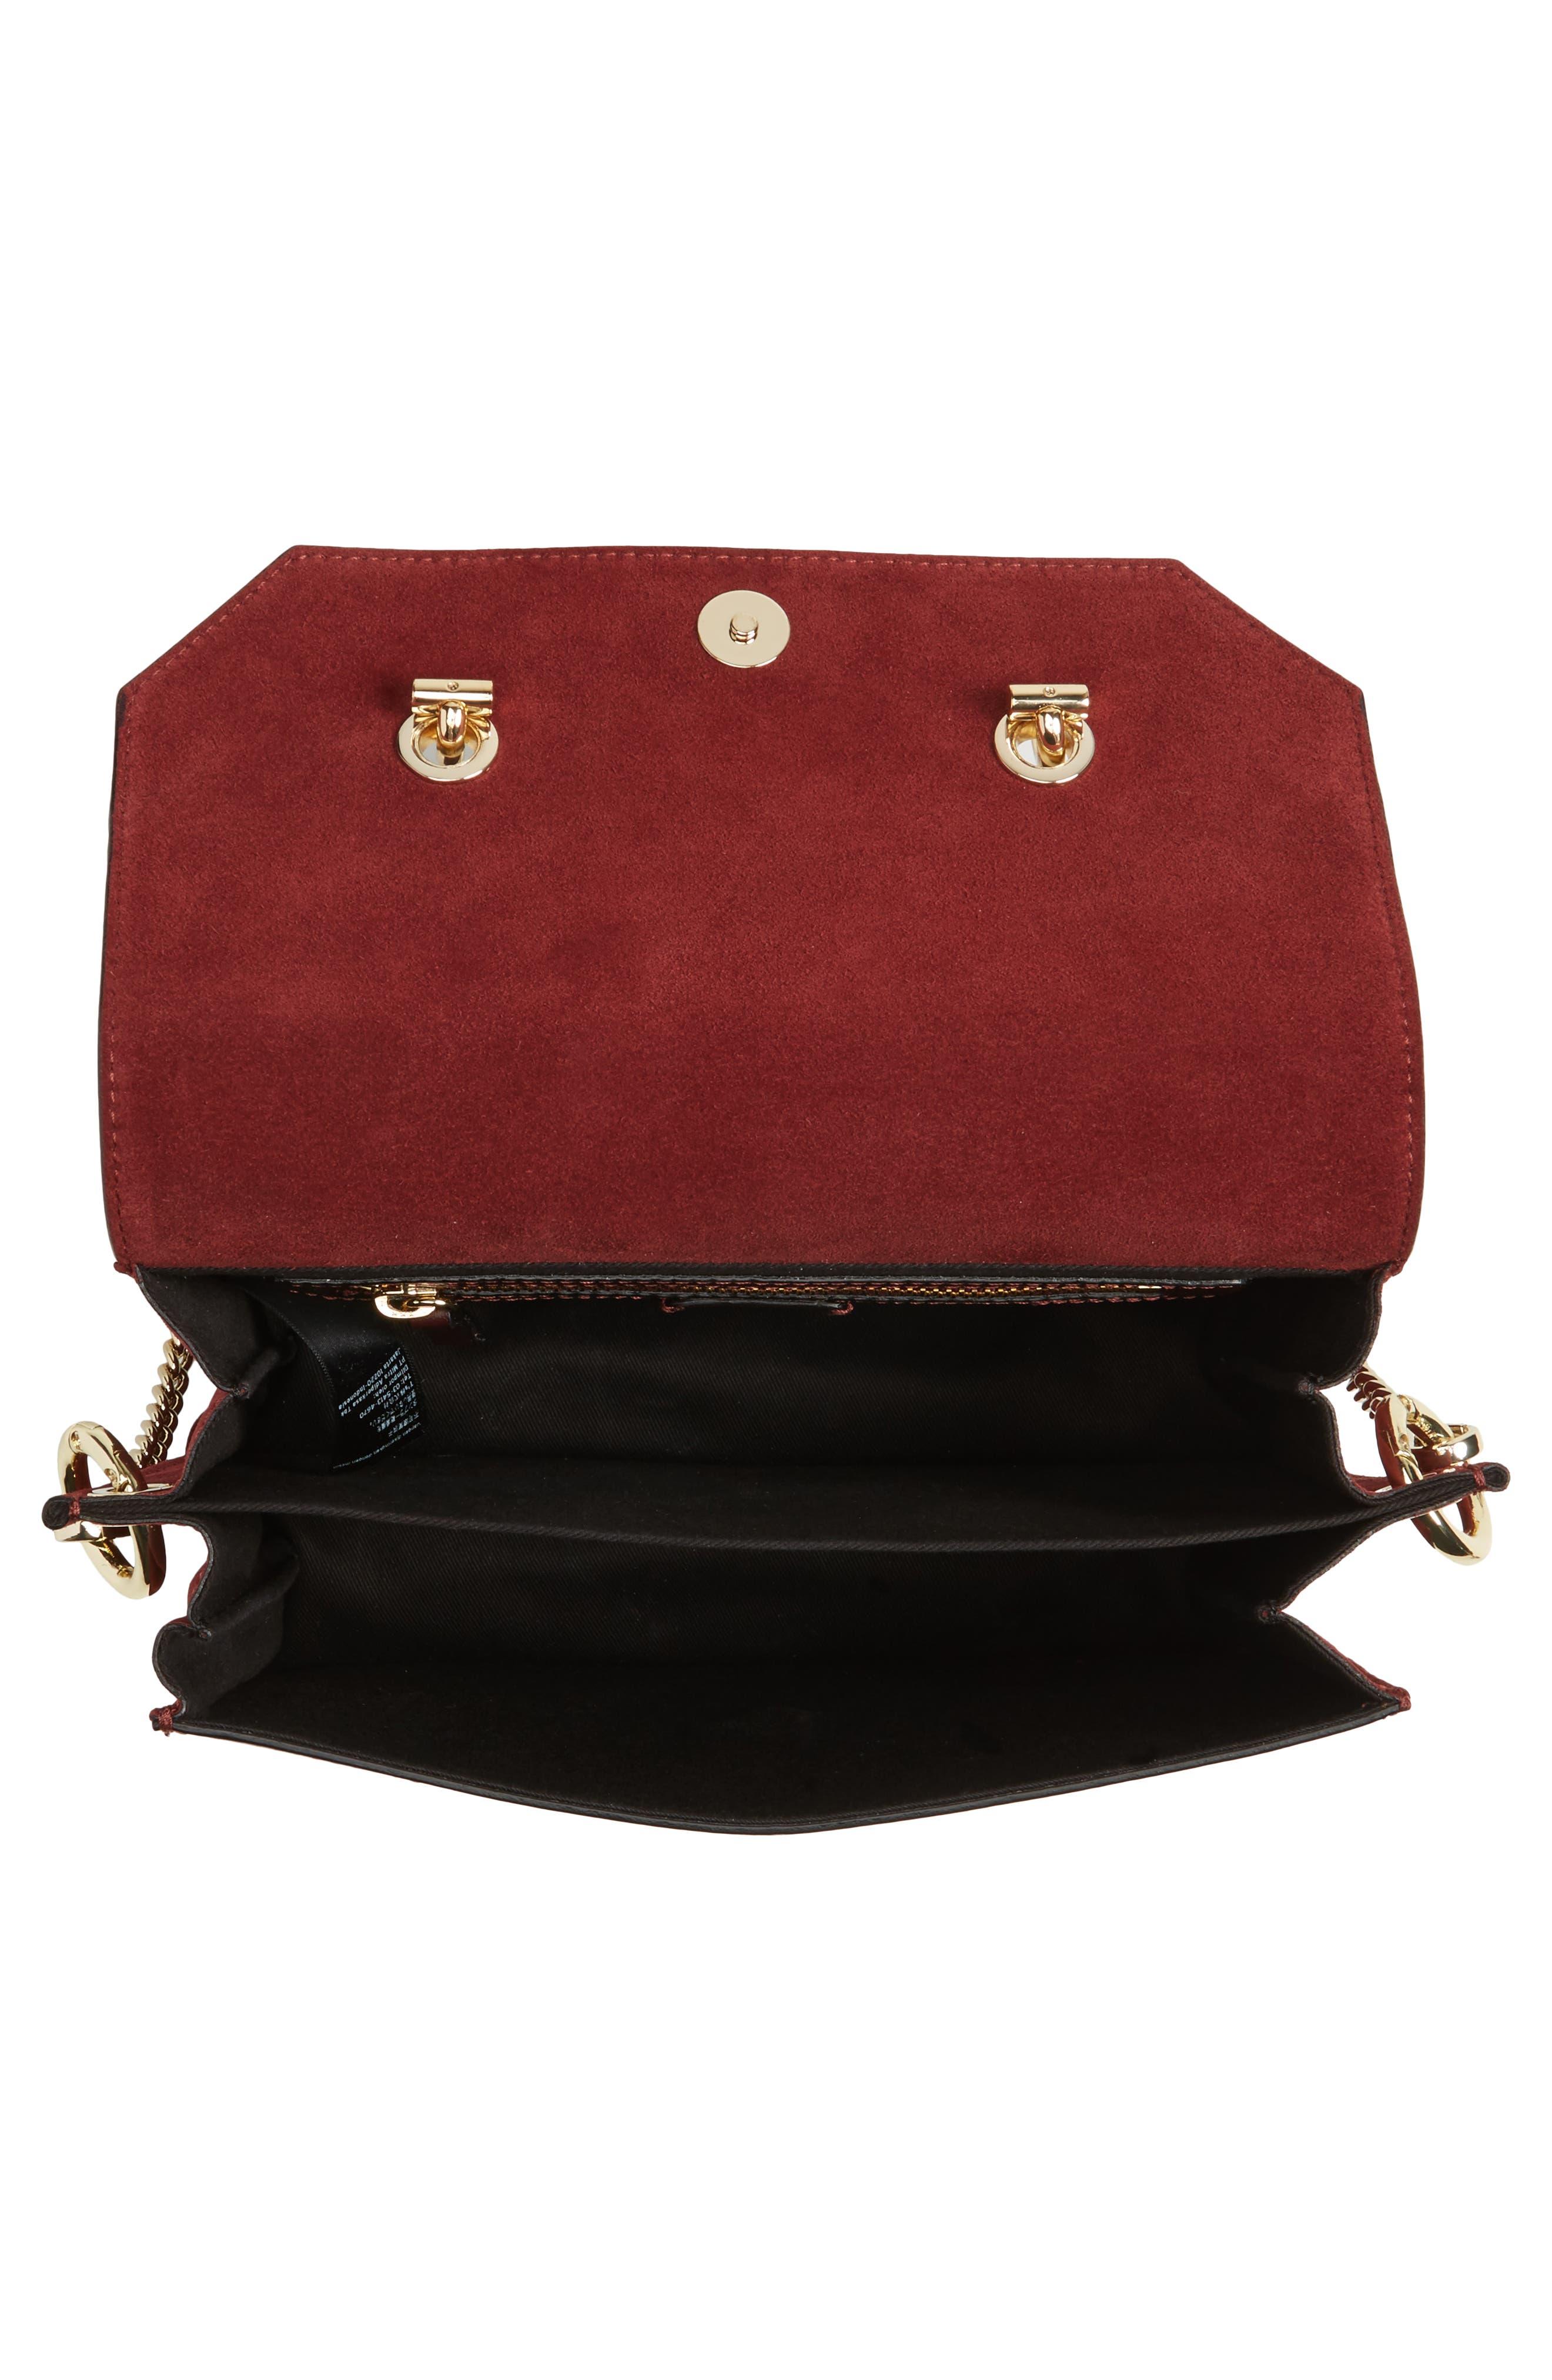 Premium Leather & Suede Soko Shoulder Bag,                             Alternate thumbnail 4, color,                             930